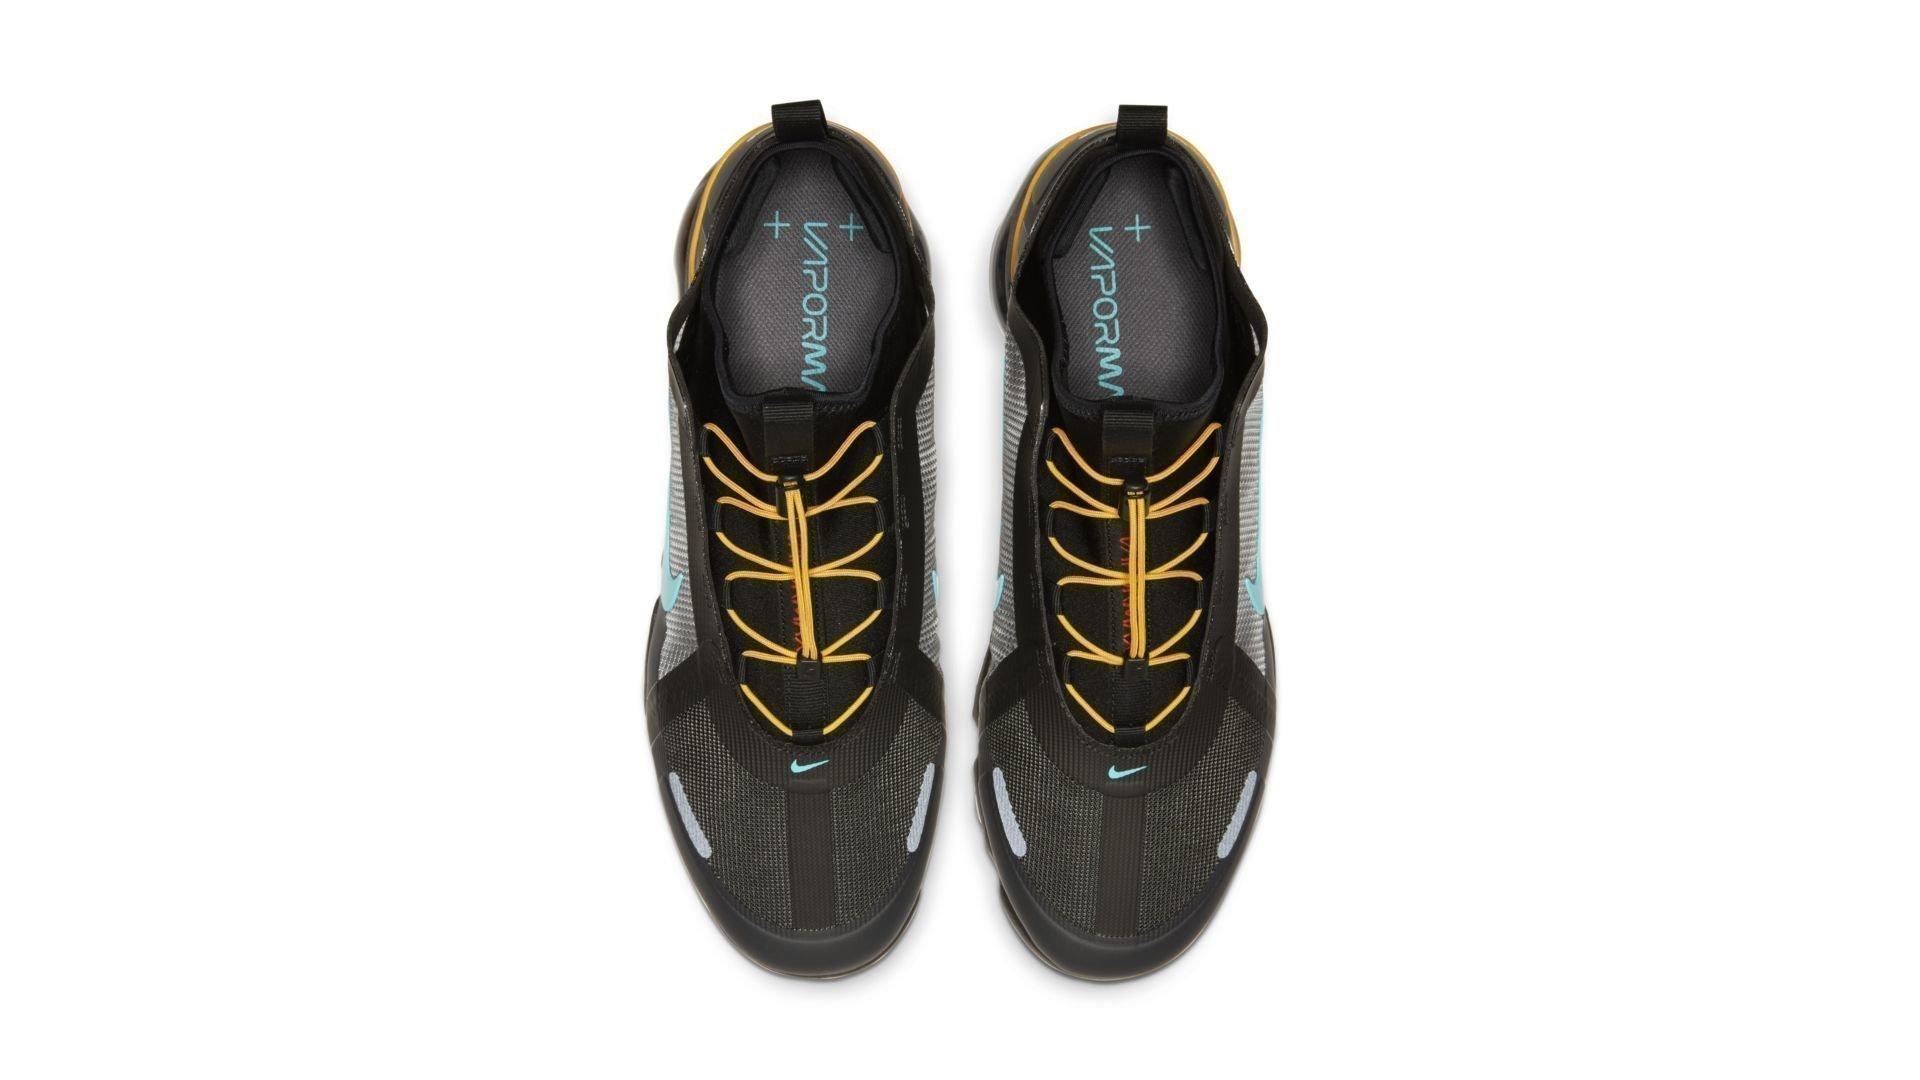 Nike Air VaporMax 2019 Utility Black Cosmic Clay Teal Nebula (BV6351-002)